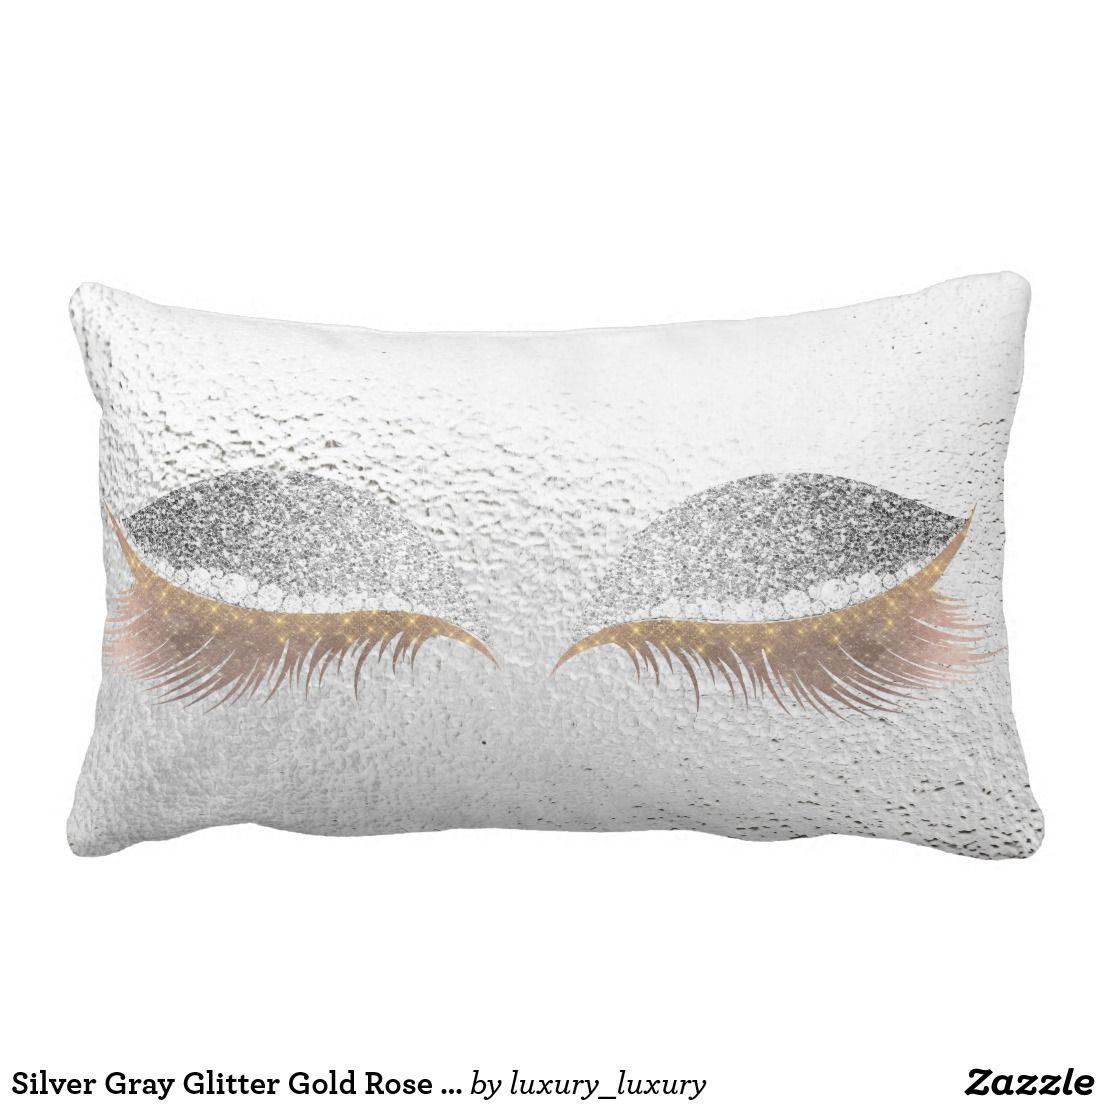 Silver Gray Glitter Gold Rose Glam Make Up Gray Lumbar Pillow